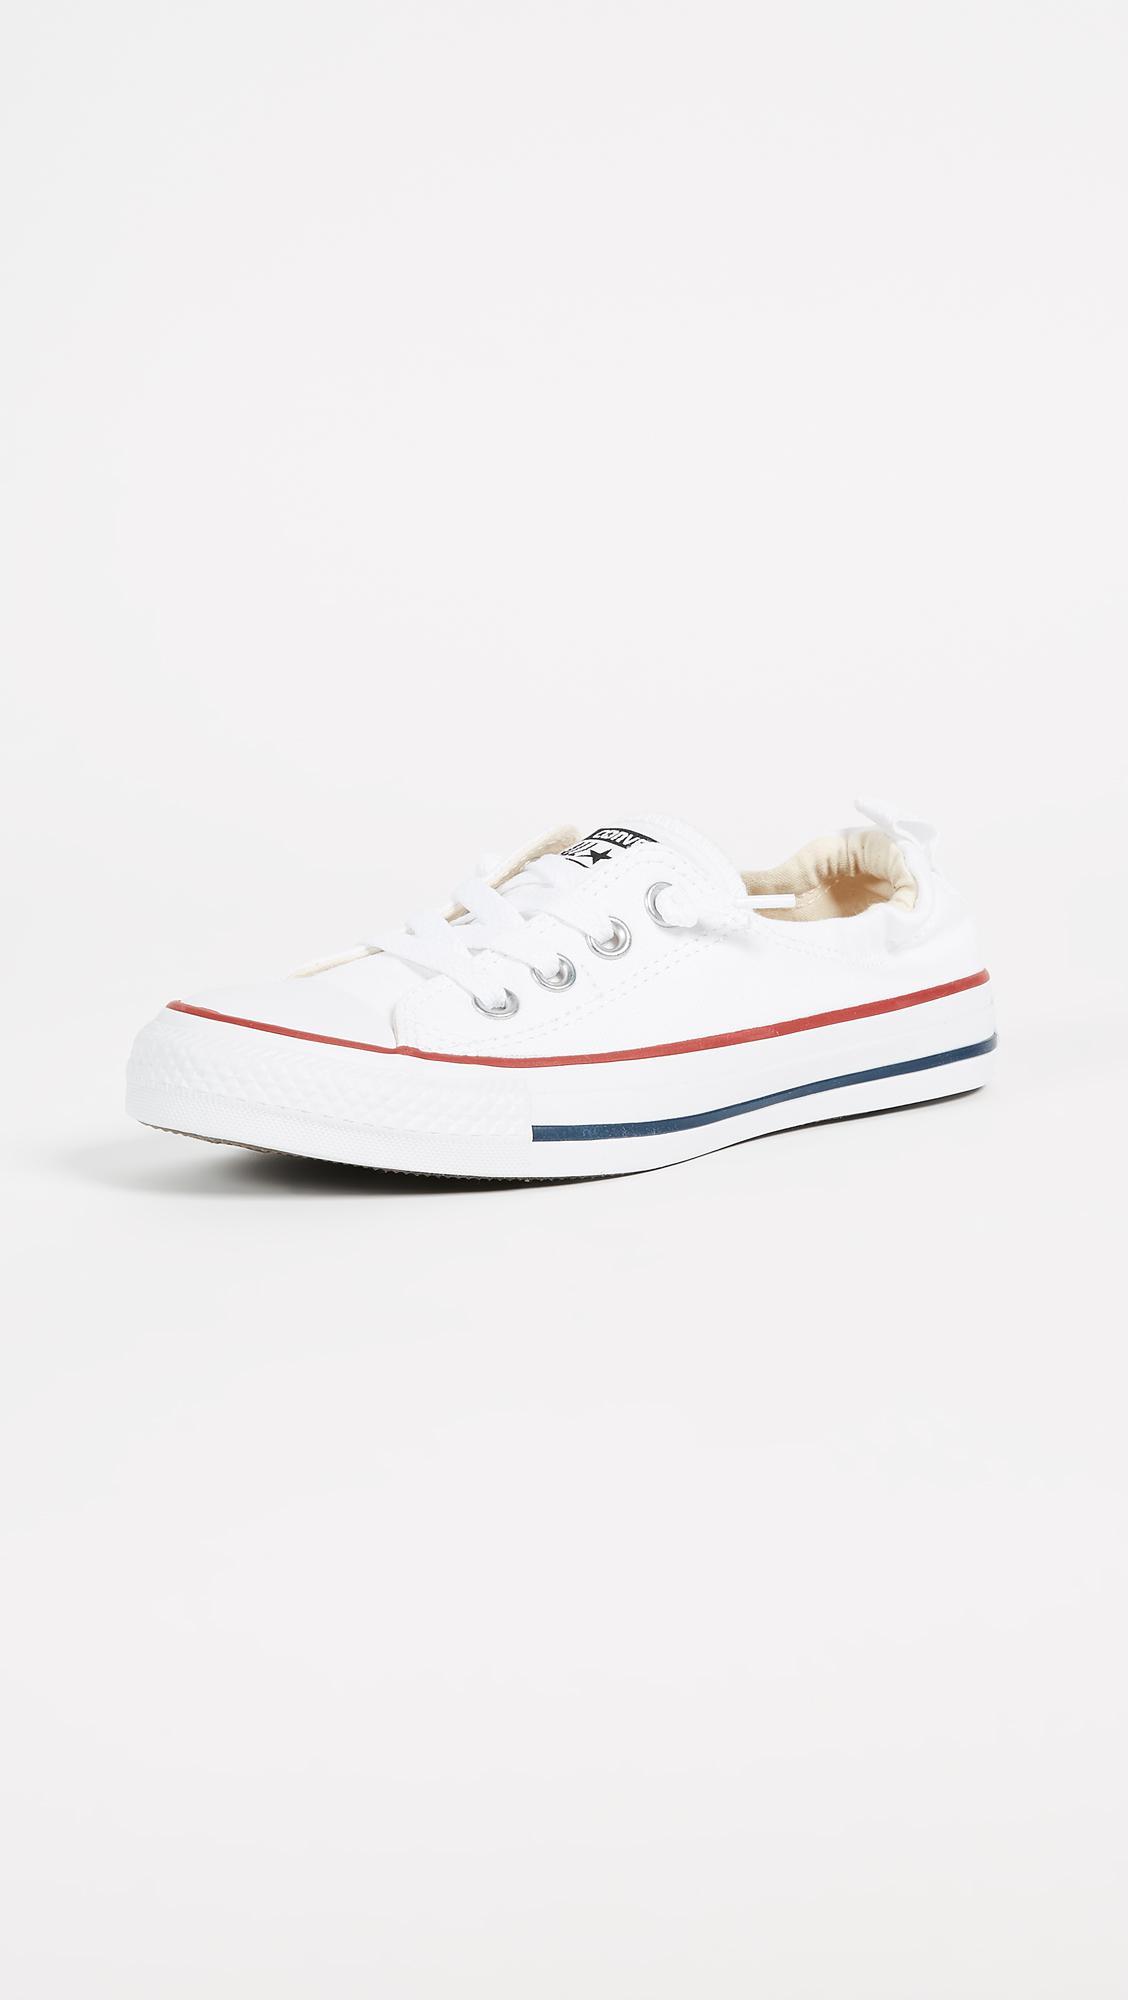 5f8765adb95cfb Converse - White Chuck Taylor All Star Shoreline Slip On Sneakers - Lyst